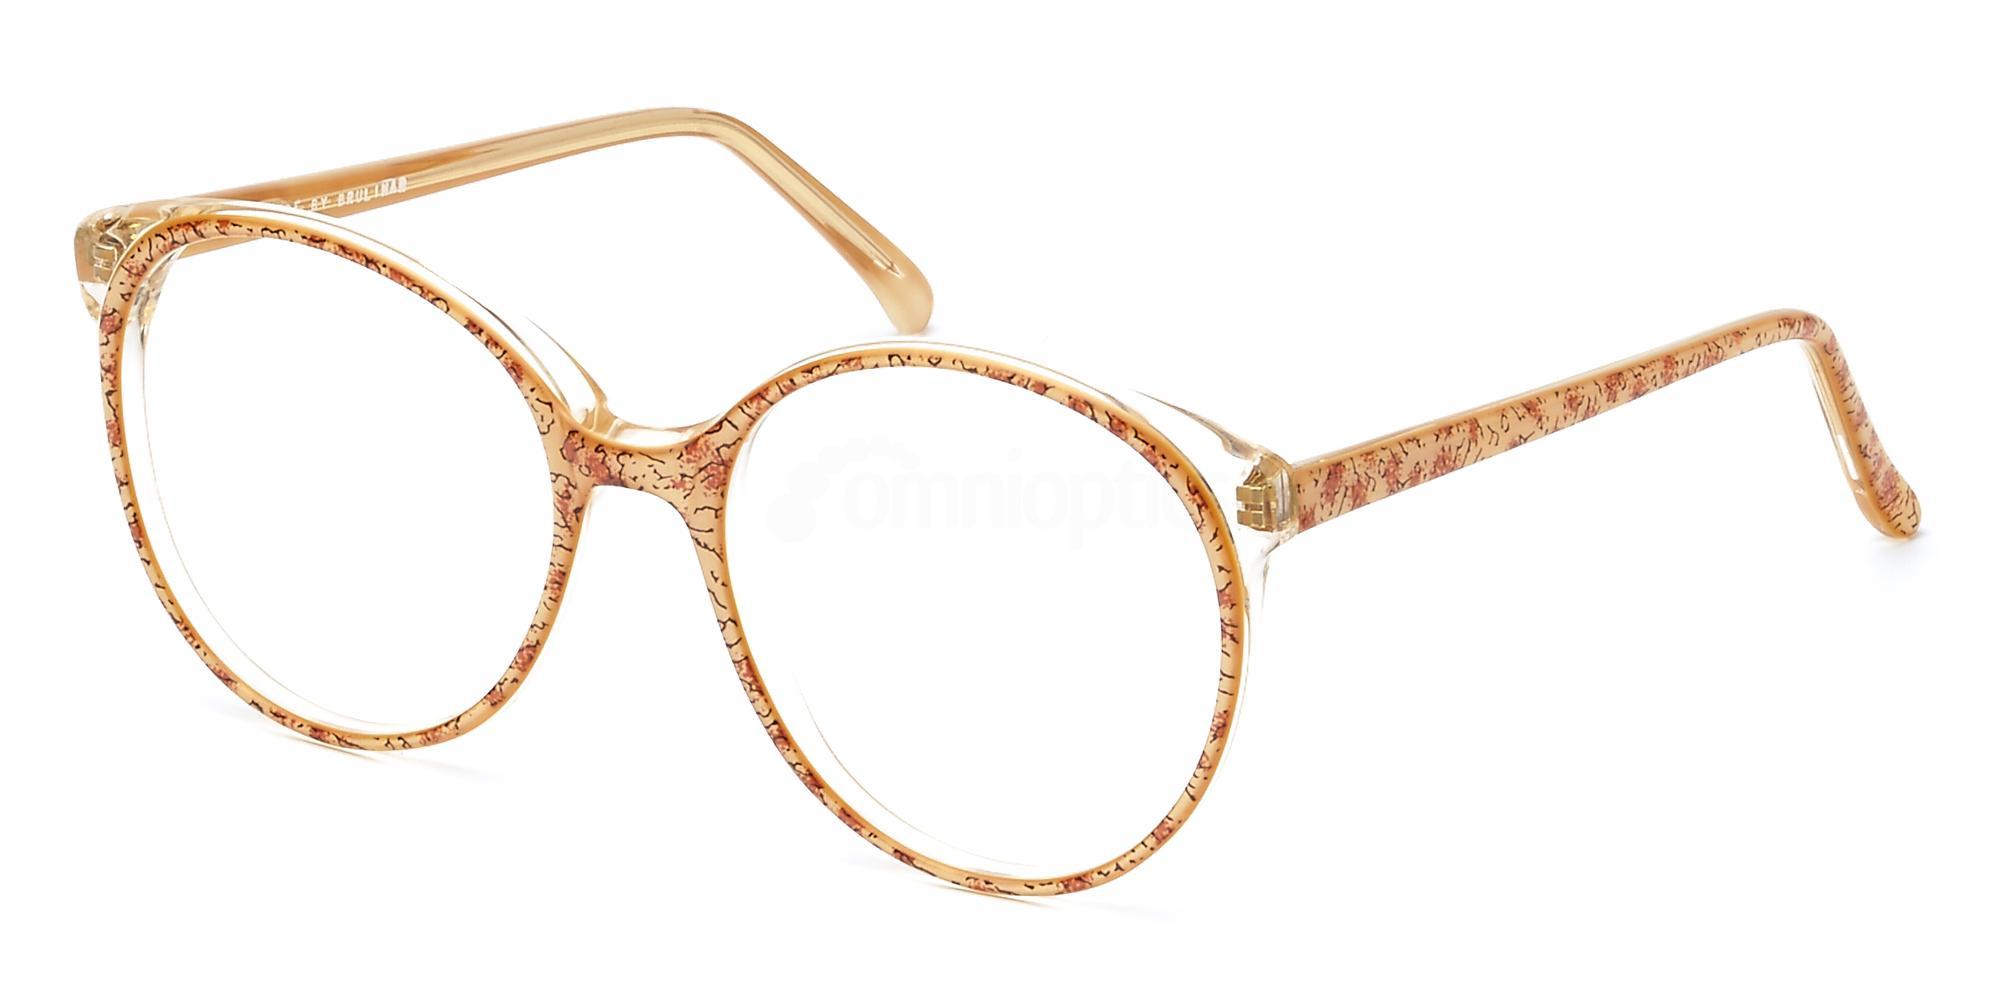 C103 ZOE2103 Glasses, Zoe Vintage